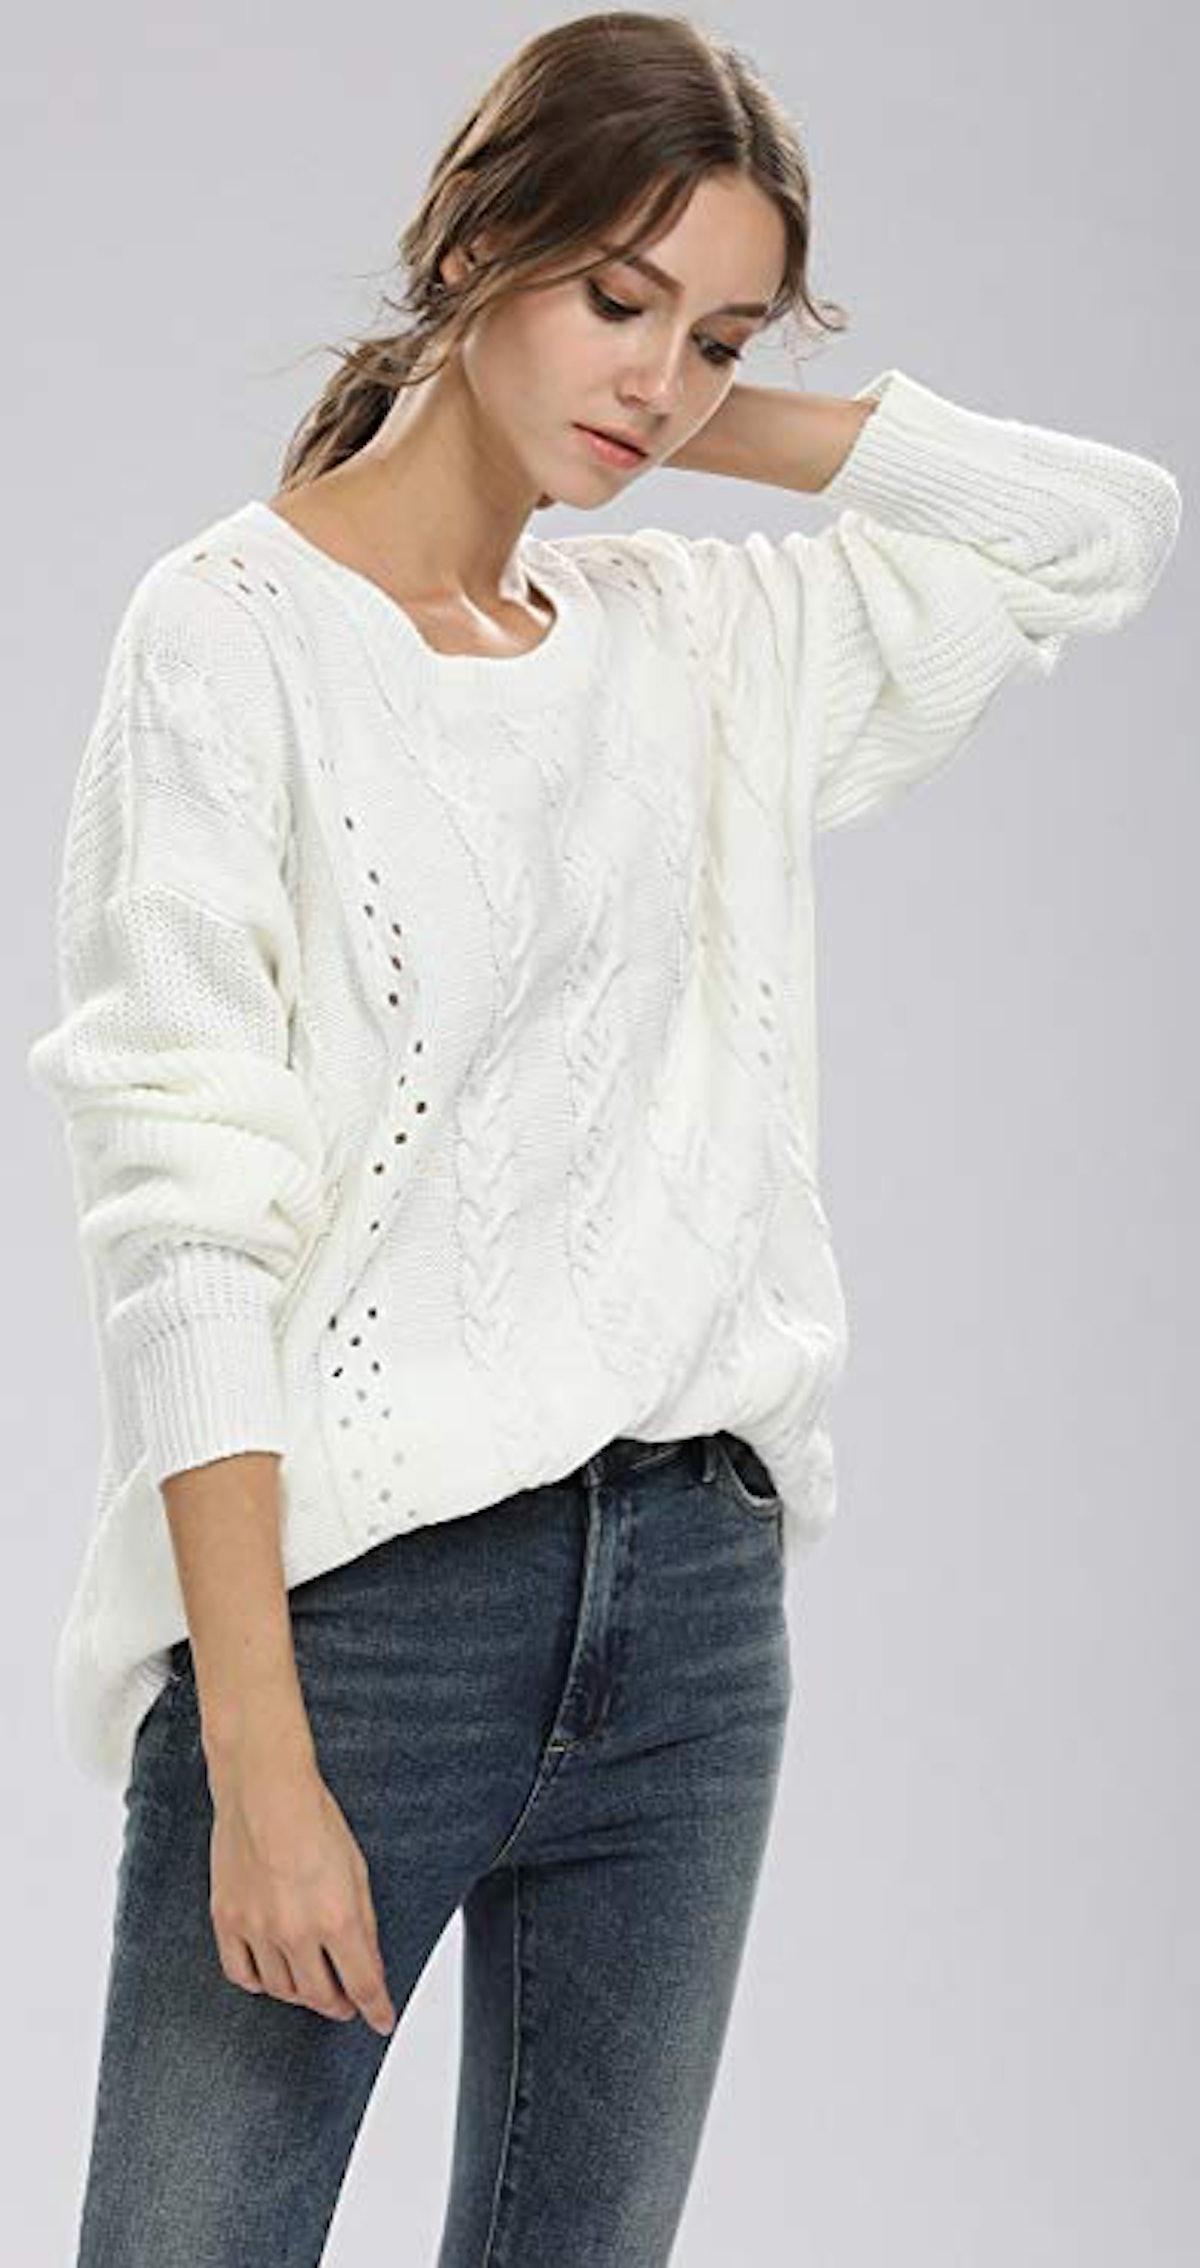 Alinfu Women's Crew Neck Knit Sweater